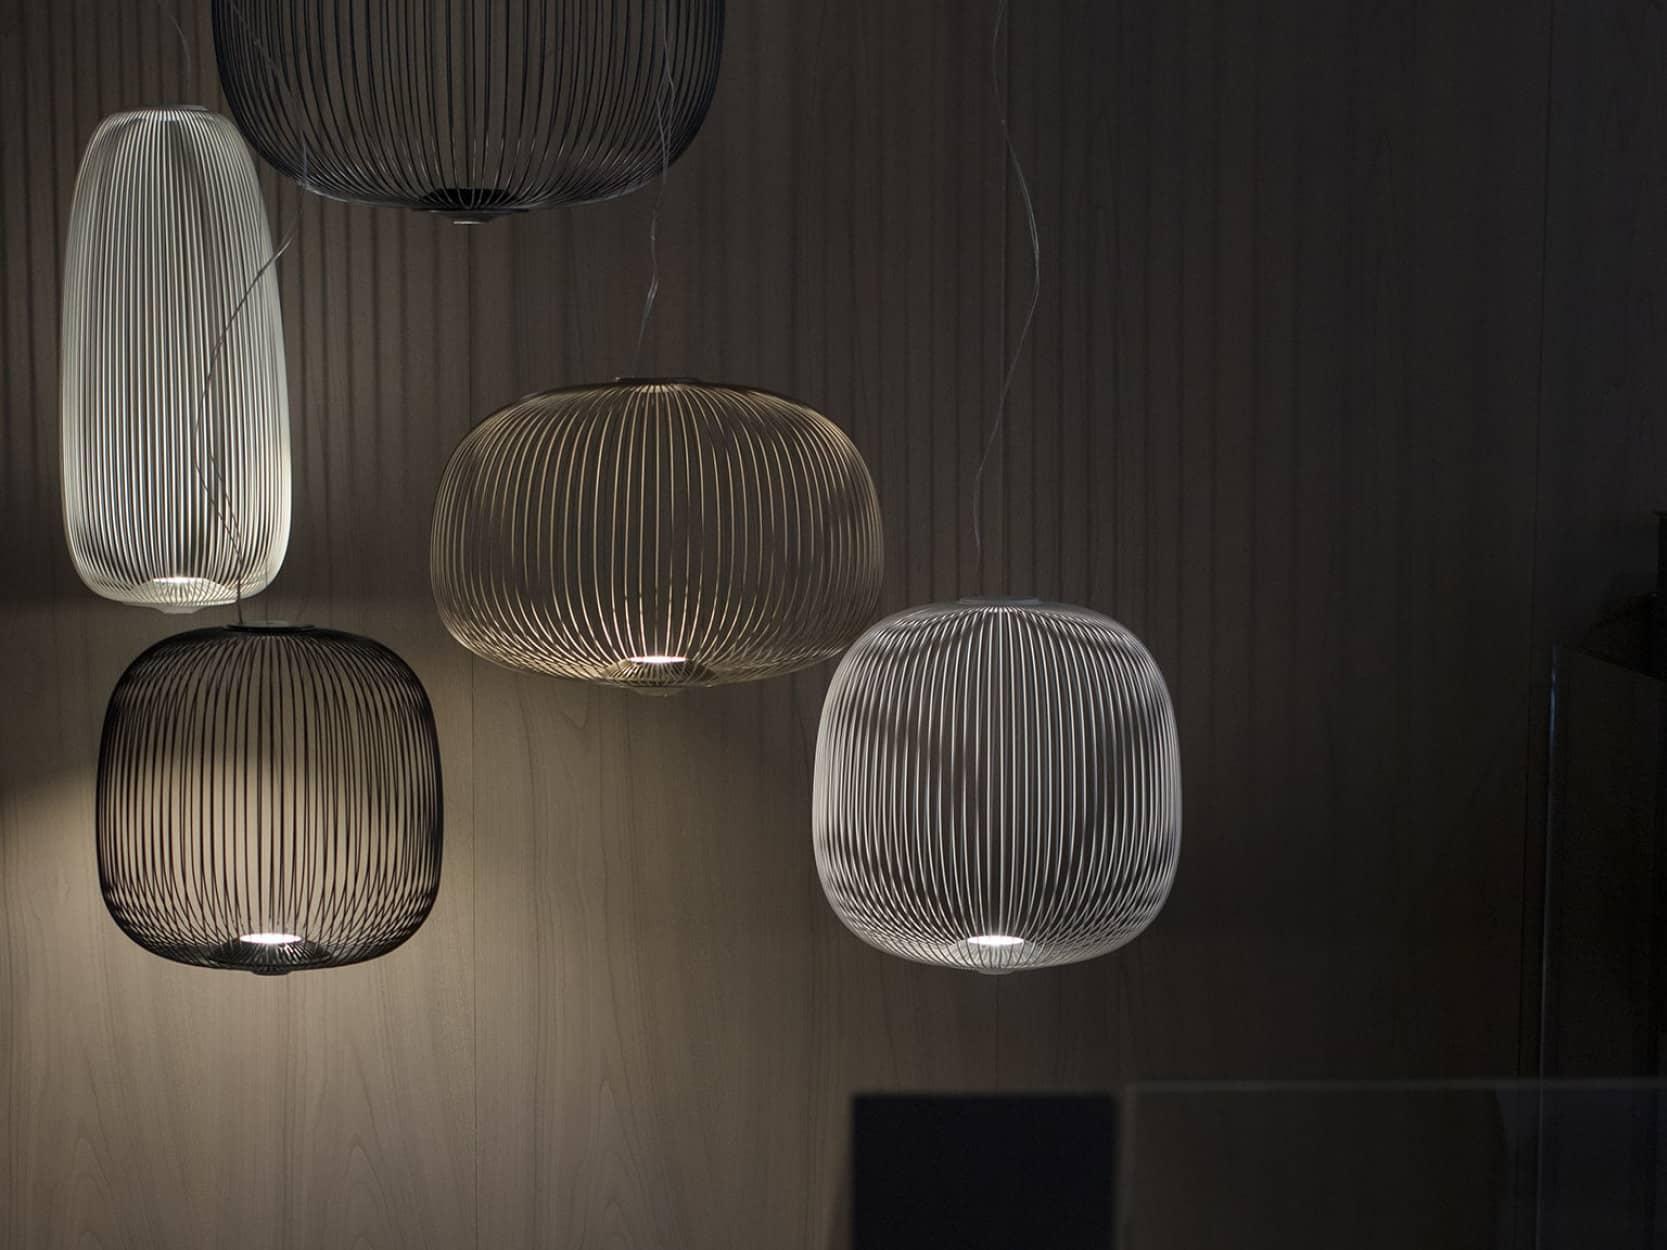 Foscarini hanglamp Spokes2 sfeer